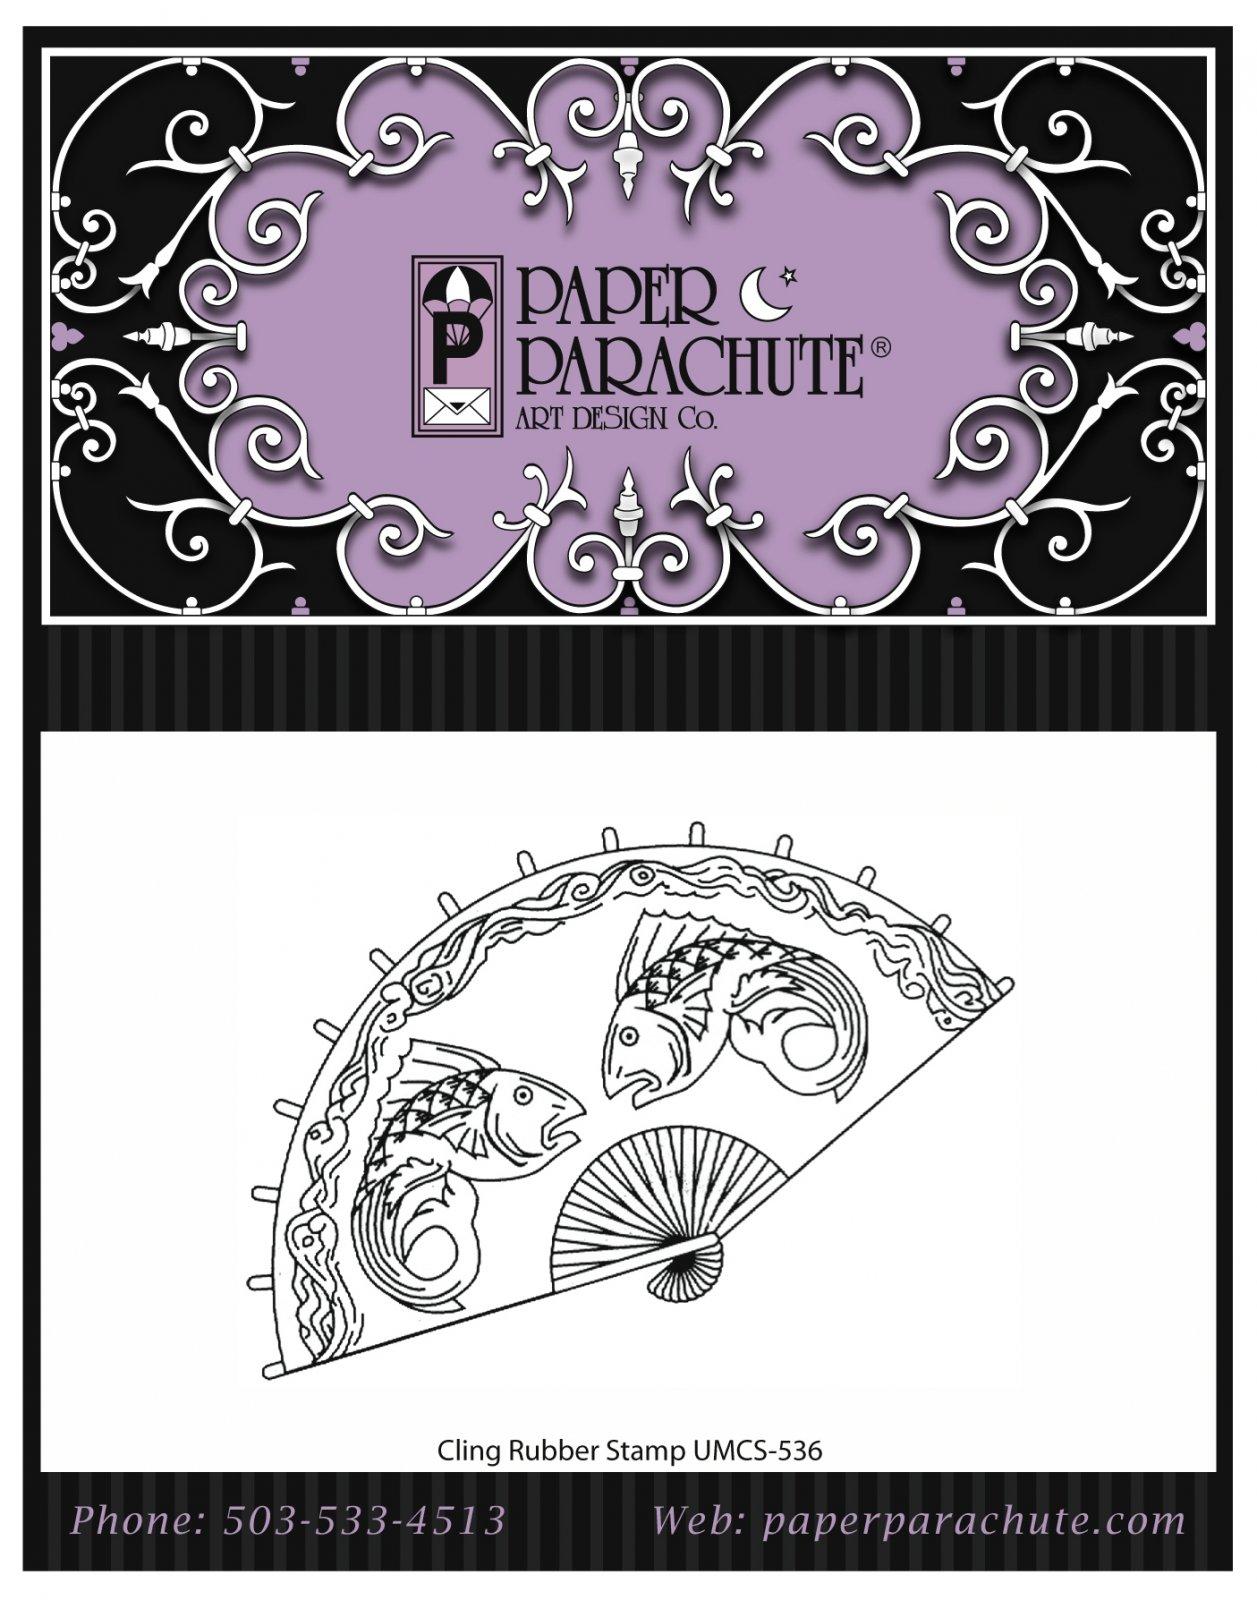 Paper Parachute Rubber Stamp - UMCS536